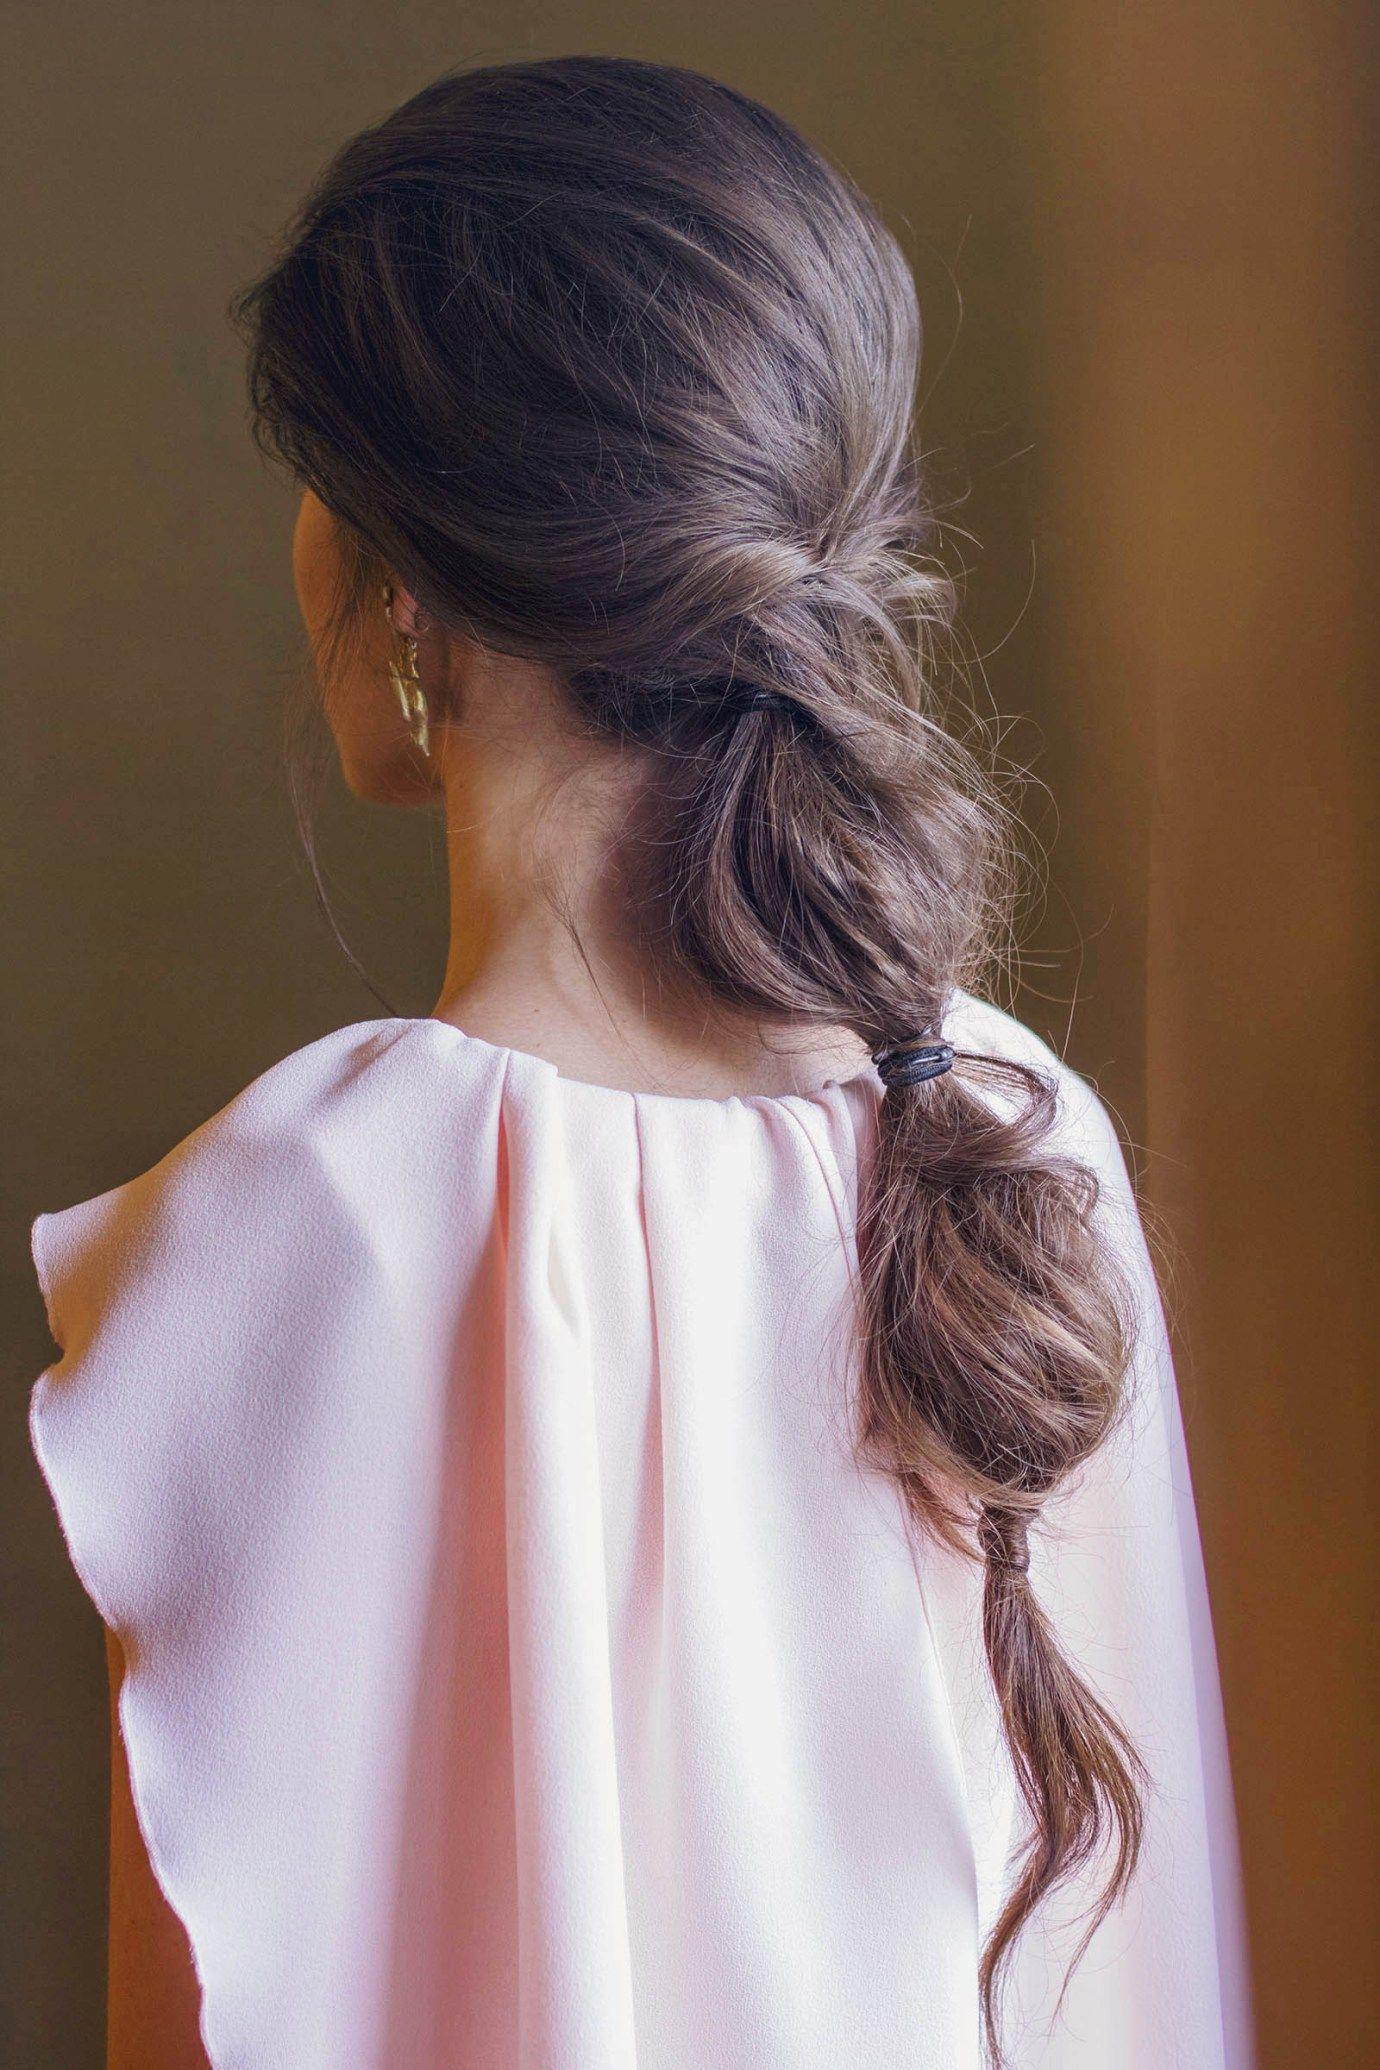 Coleta Burbuja Peinado Invitada Novia Hair Peinados Con Coleta